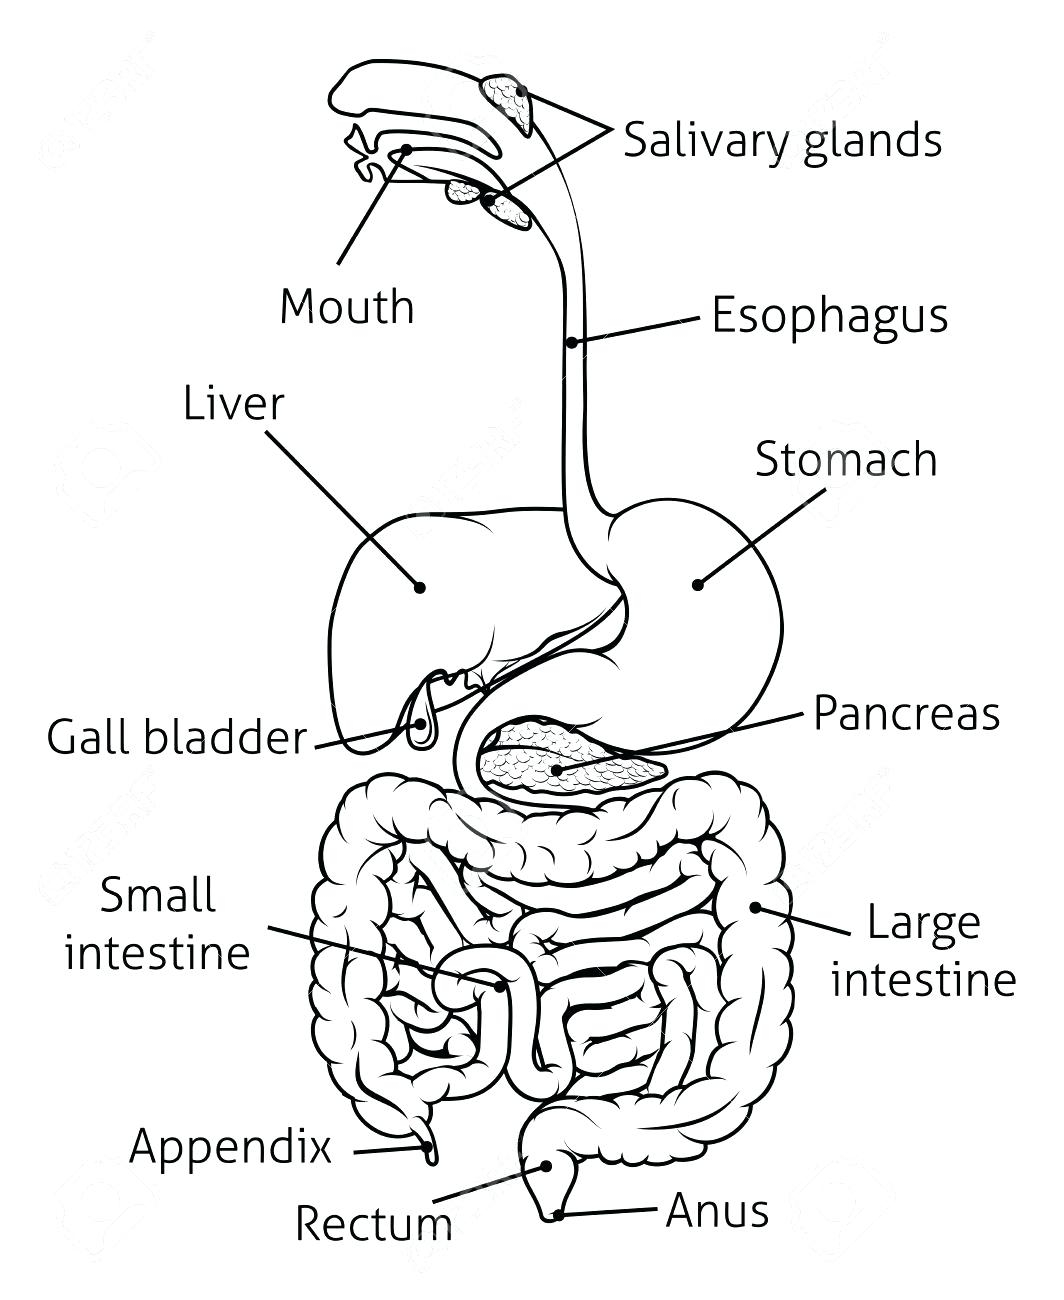 Human Digestive System Drawing At Getdrawings